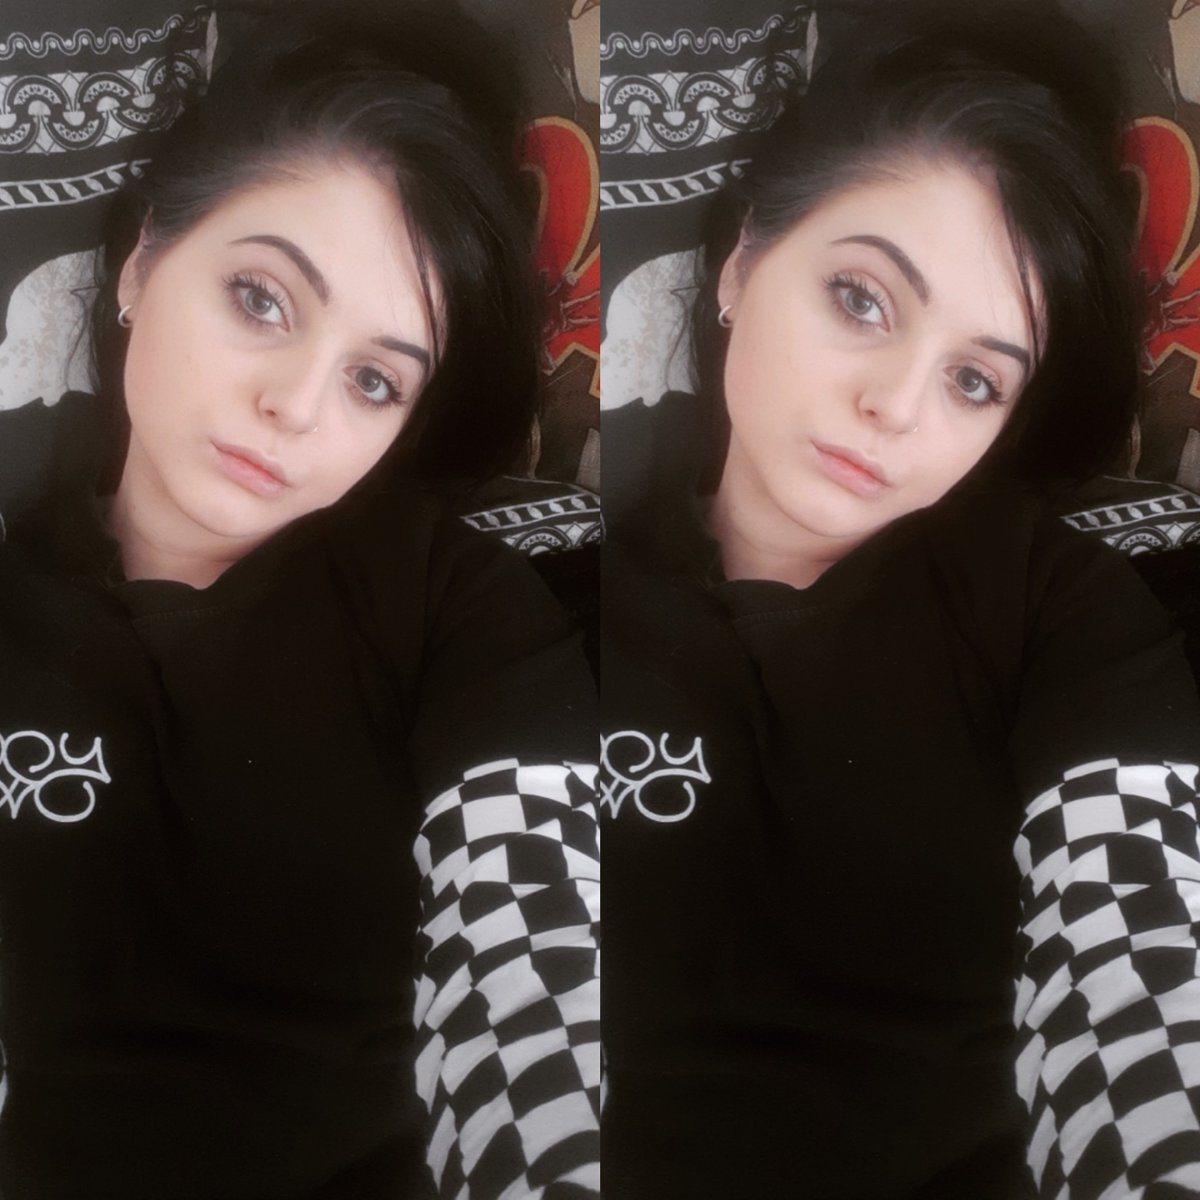 No amount of make up or filters can make my eye bags disappear #tired #blackhair #rocknroll #rocksinger #nosestud #nosering #piercing #gothic #gothicgirls #grunge #alternative #femalefronted #rockband #hardrock #swallowsanddaggers #kaylyde #femalesinger pic.twitter.com/sgf8LSmCXl